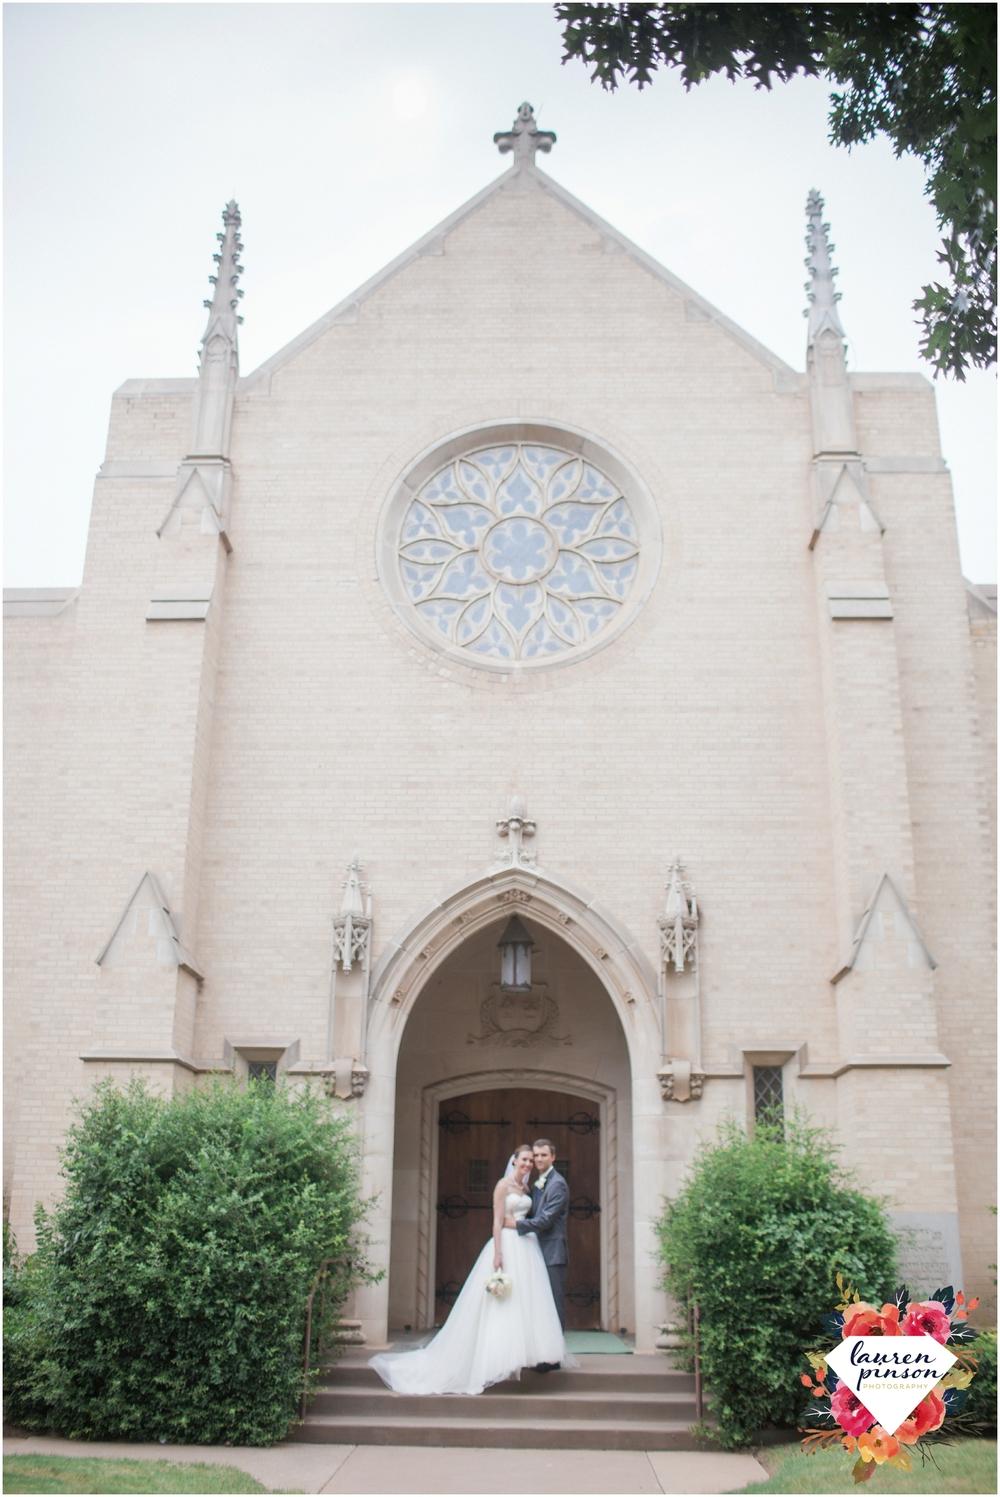 wichita-falls-wedding-photography-at-fain-presbyterian-church-and-the-wellington-timeless-classic-modern-photographer_1170.jpg